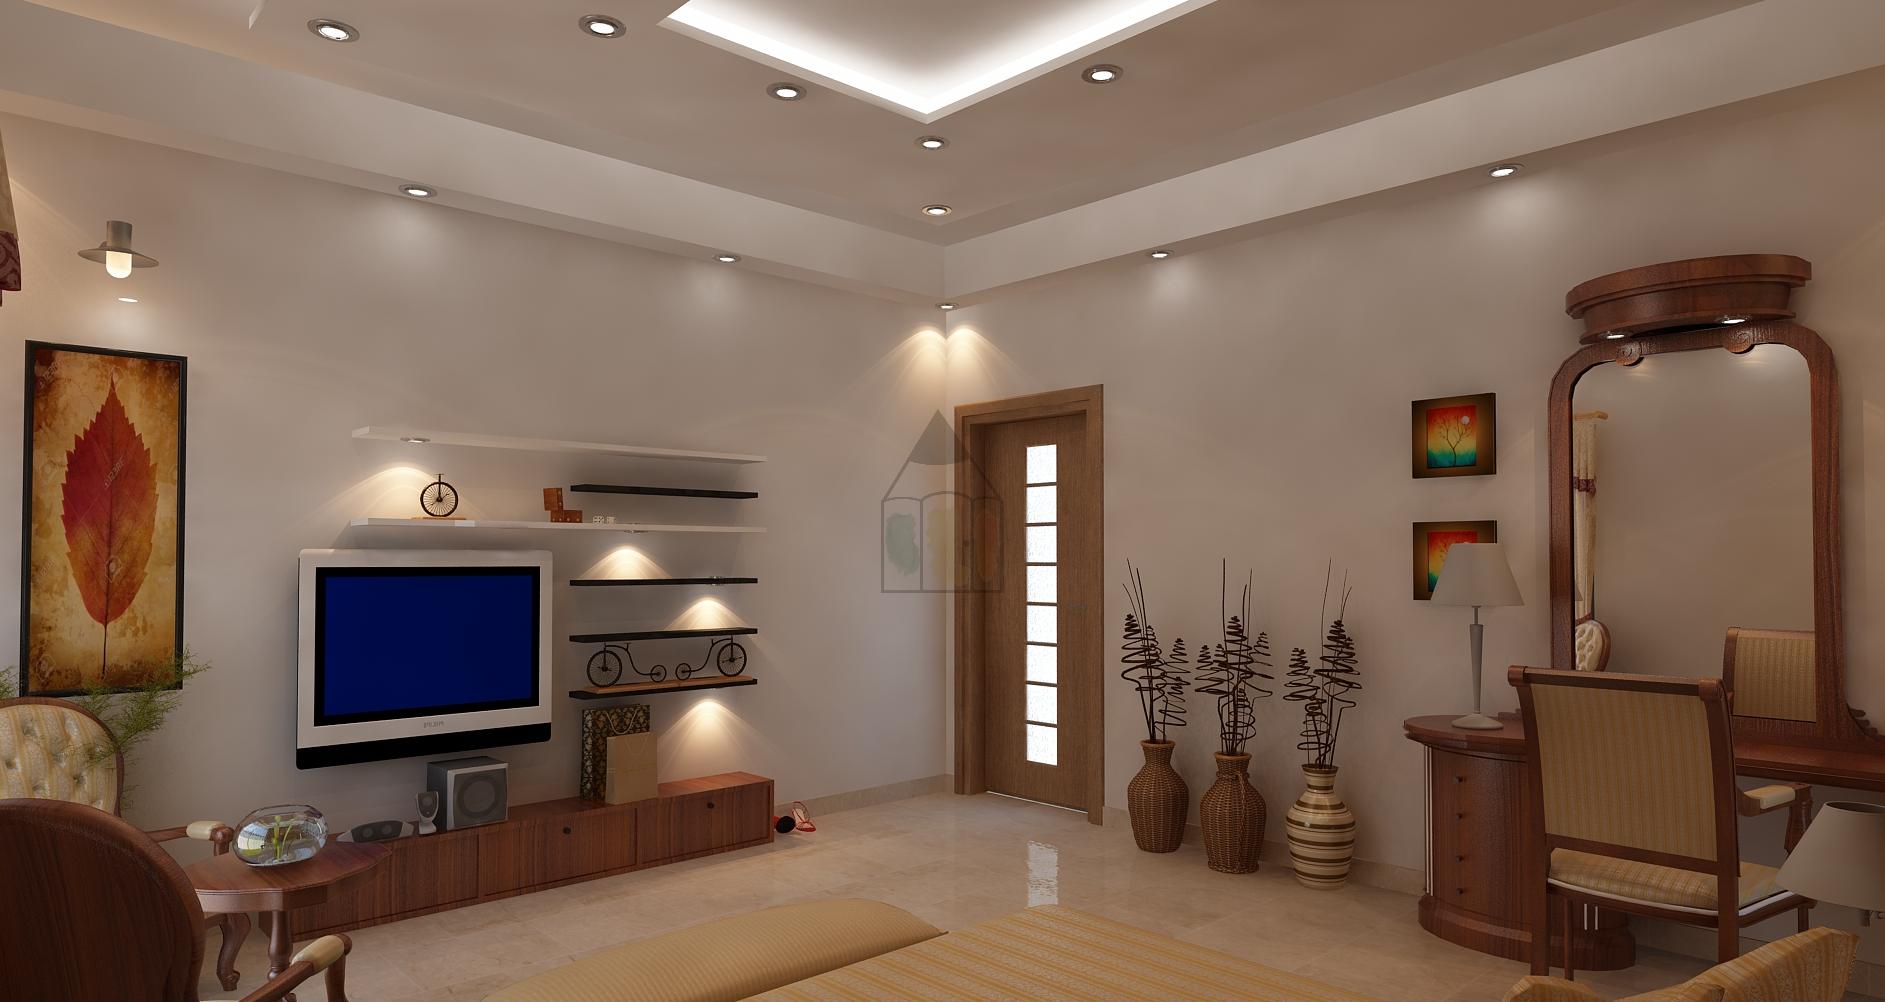 false ceiling design for bedroom bedroom with complete